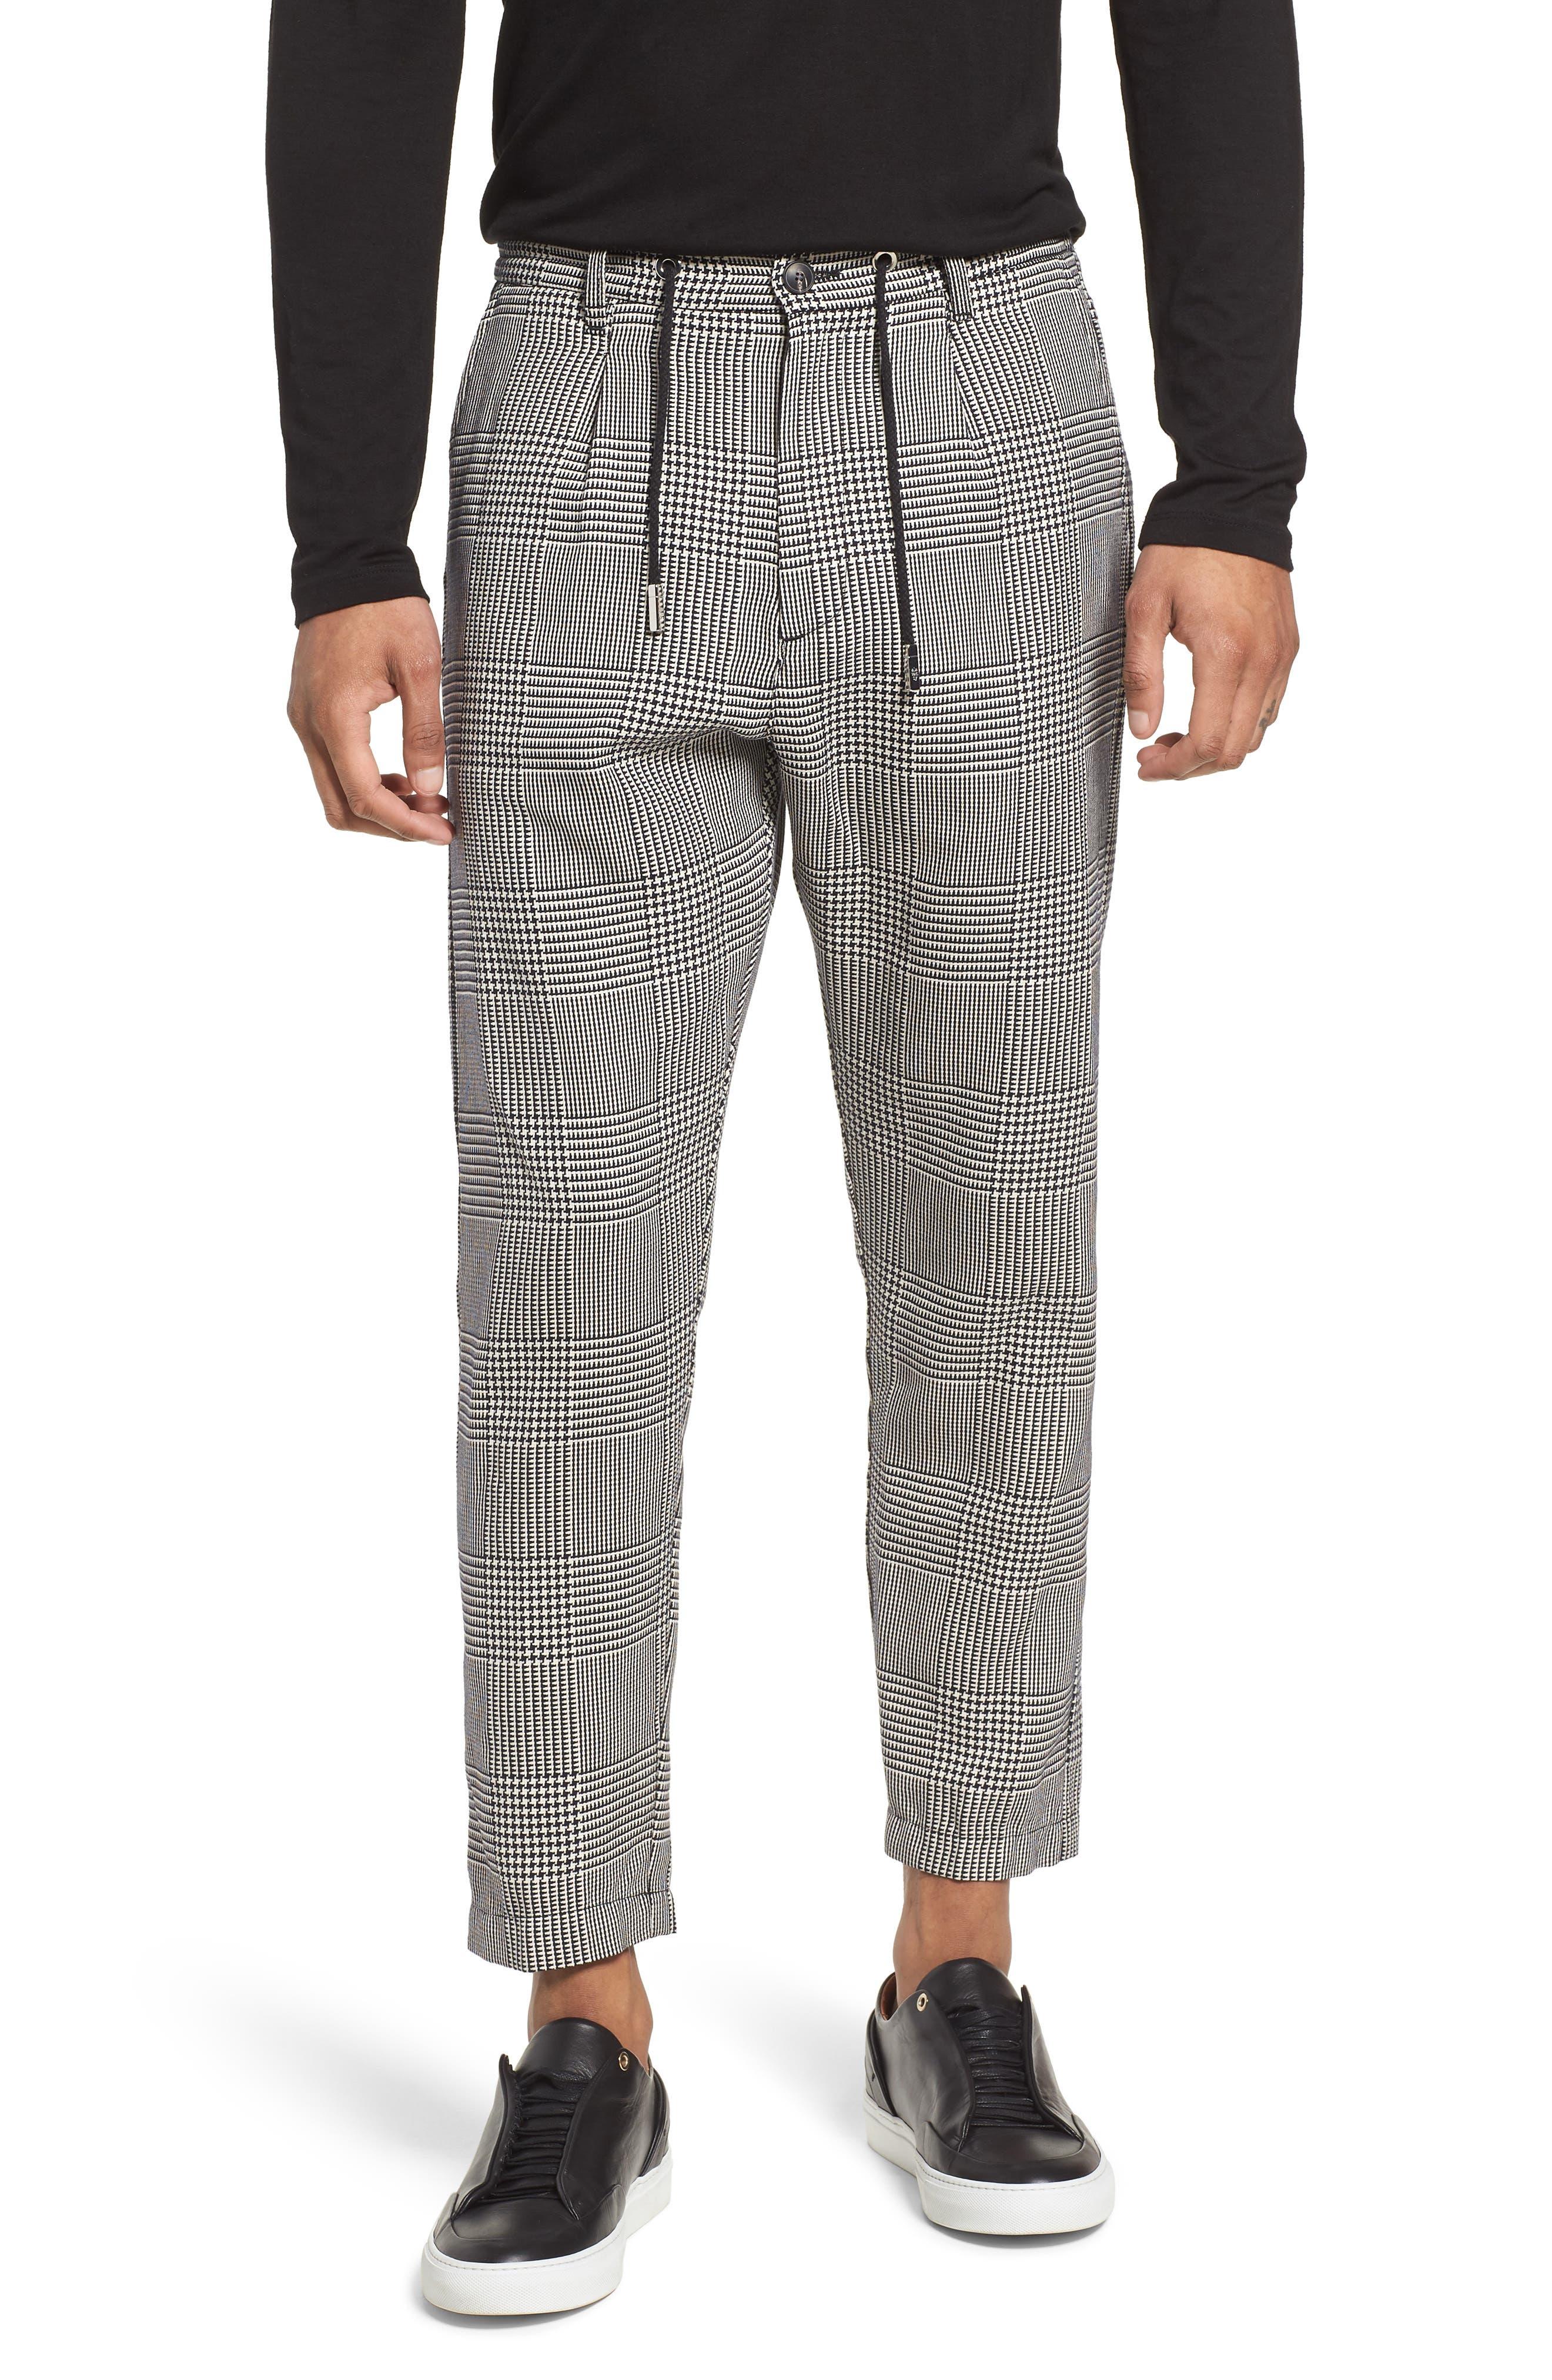 Prince of Wales Check Jogger Pants,                         Main,                         color, Blk/White